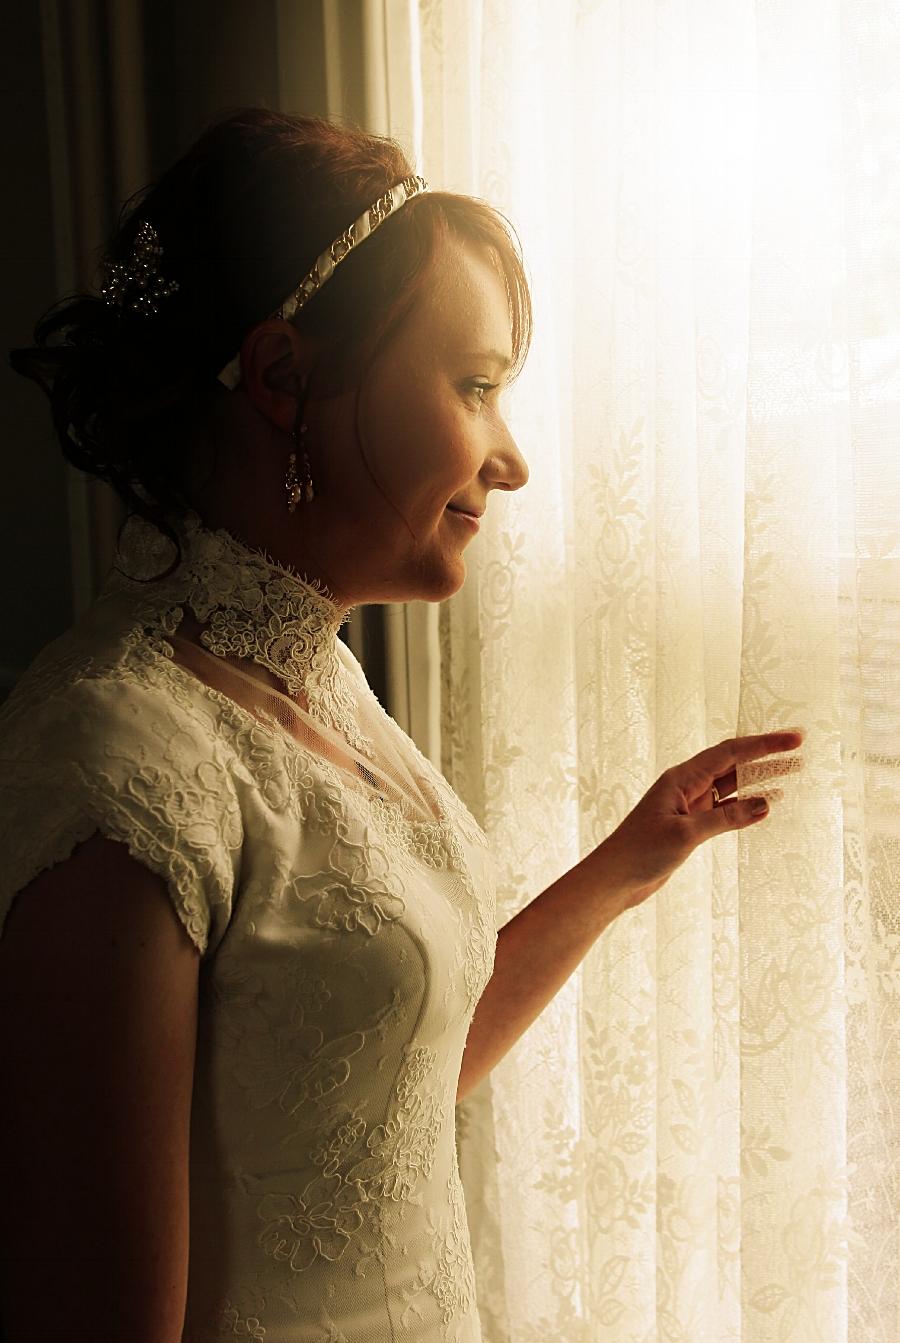 Wedding photography in Bountiful, by Kelly Loveless